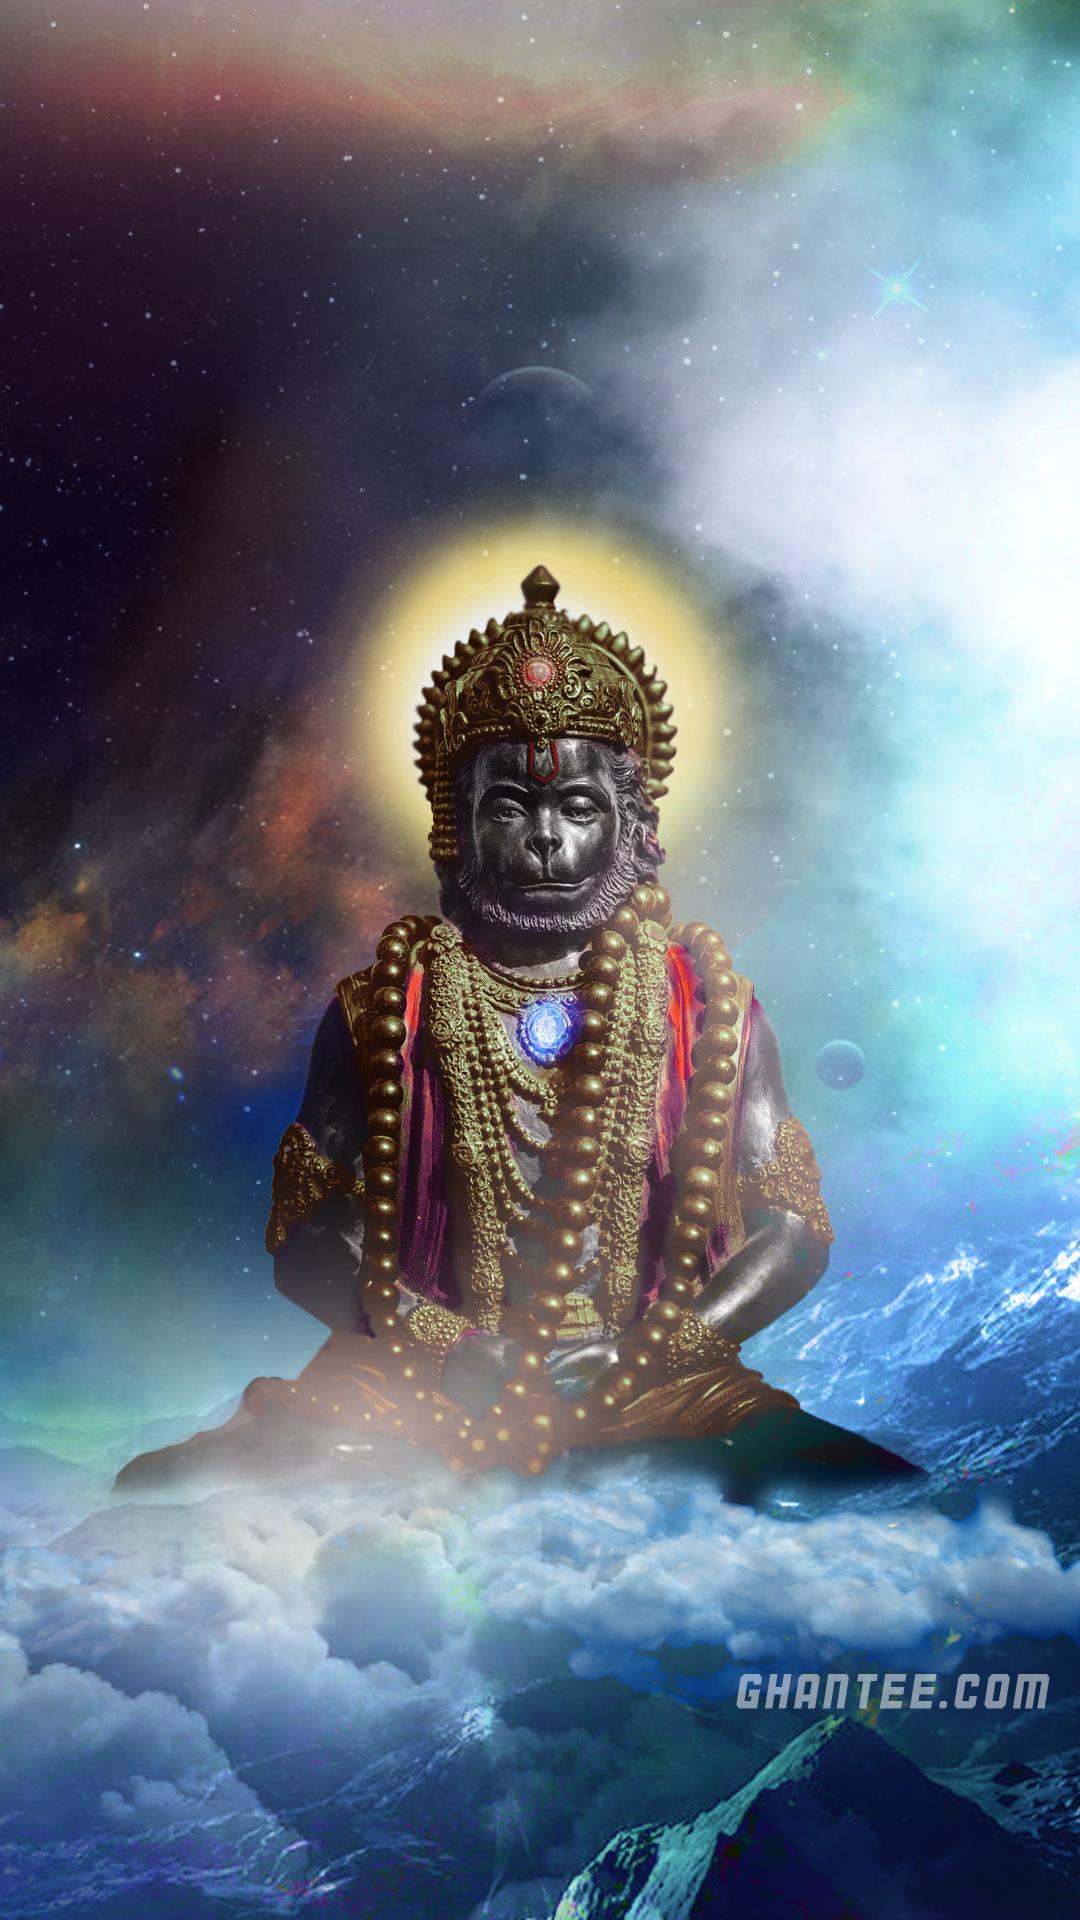 lord hanuman larger hd phone wallpaper